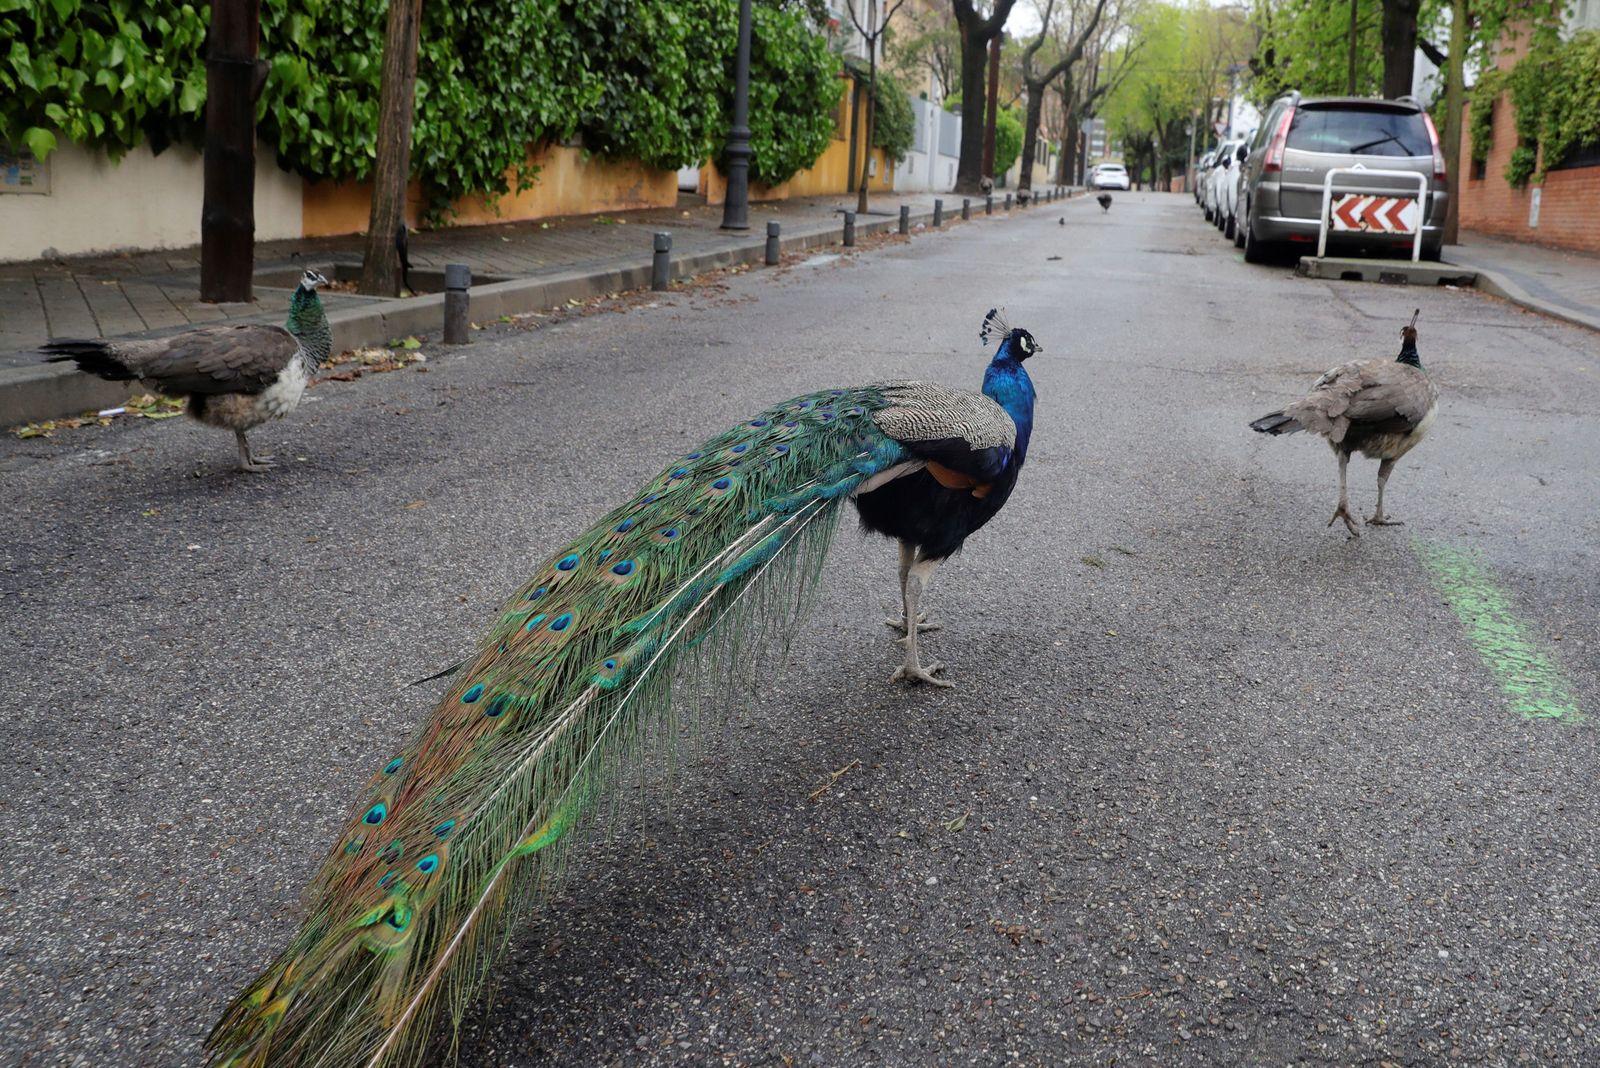 Daily life amid coronavirus pandemic, in Madrid, Spain - 01 Apr 2020